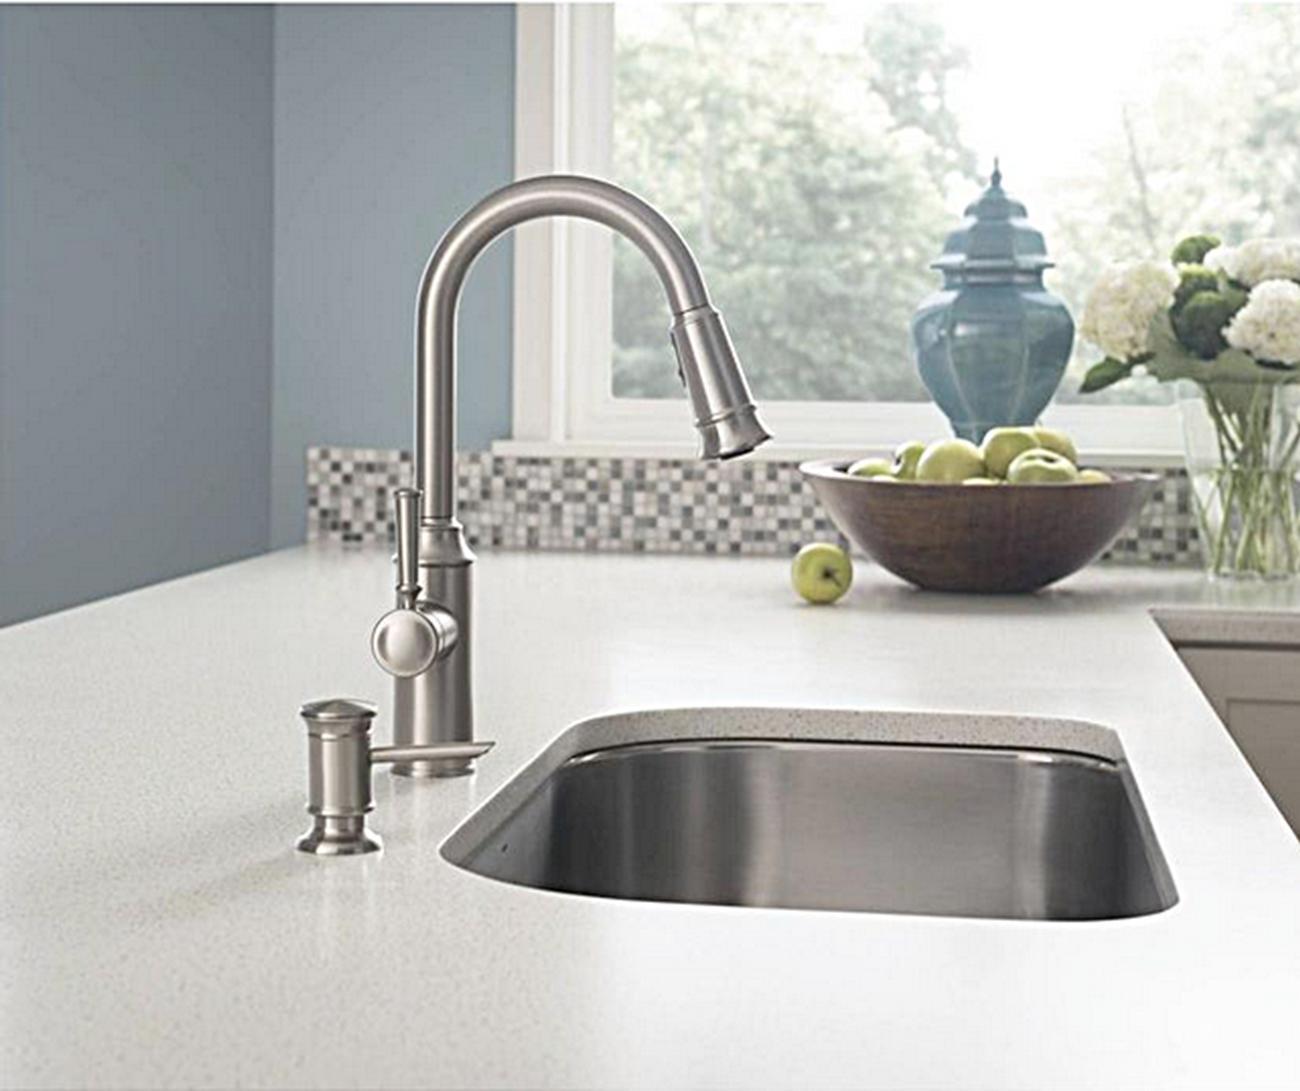 Moen Glenshire 87731SRS Stainless Kitchen Faucet Soap Dispenser